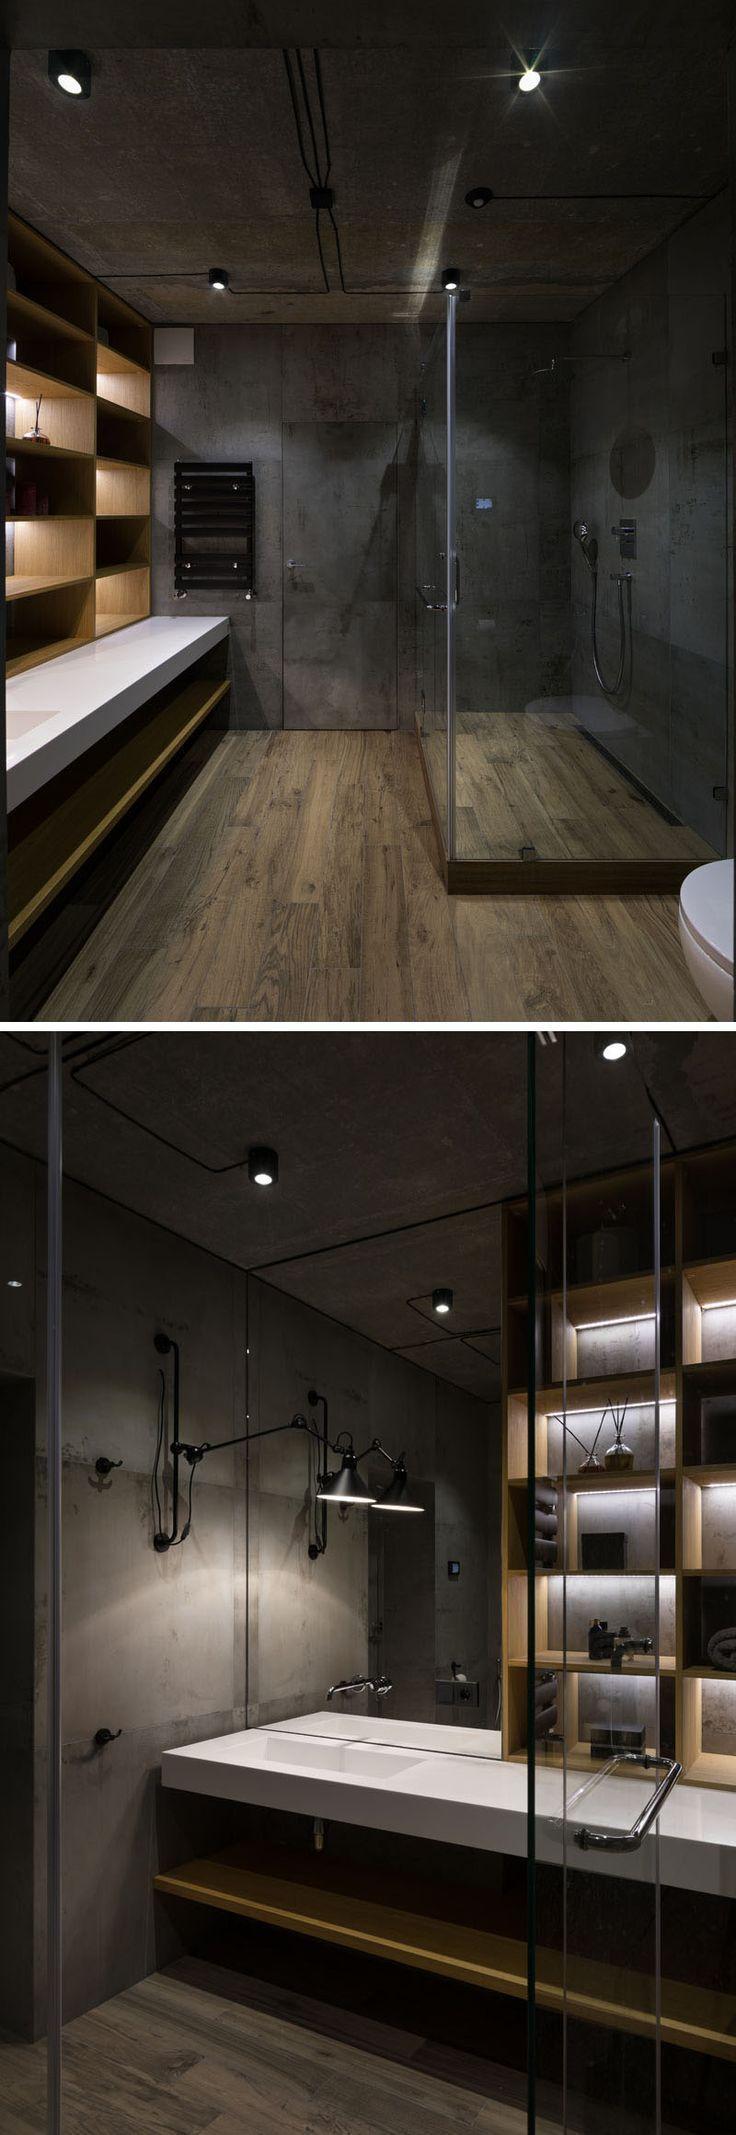 Sergey Makhno has designed a modern apartment interior in Kiev, Ukraine -…   – Bad